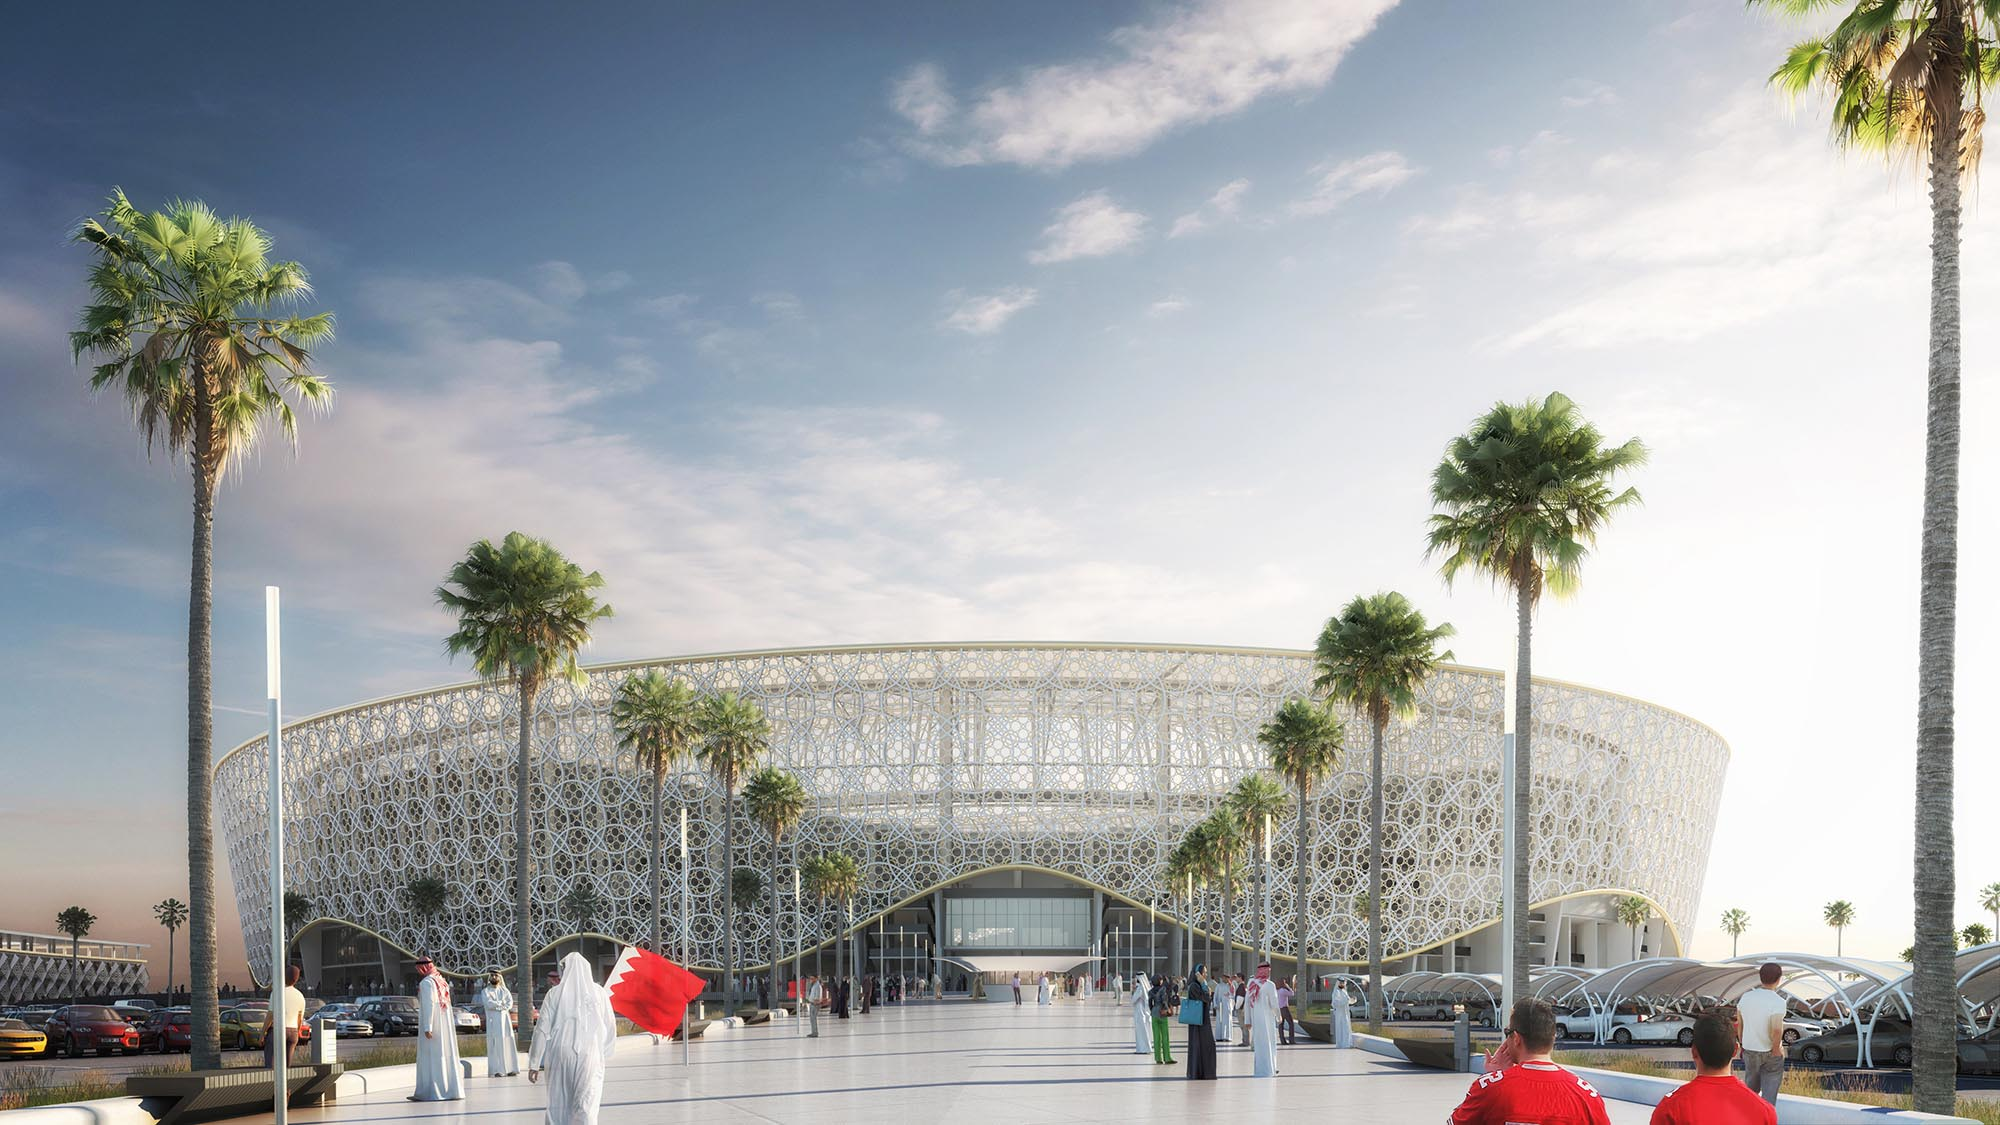 BAHRAIN FIFA STADION